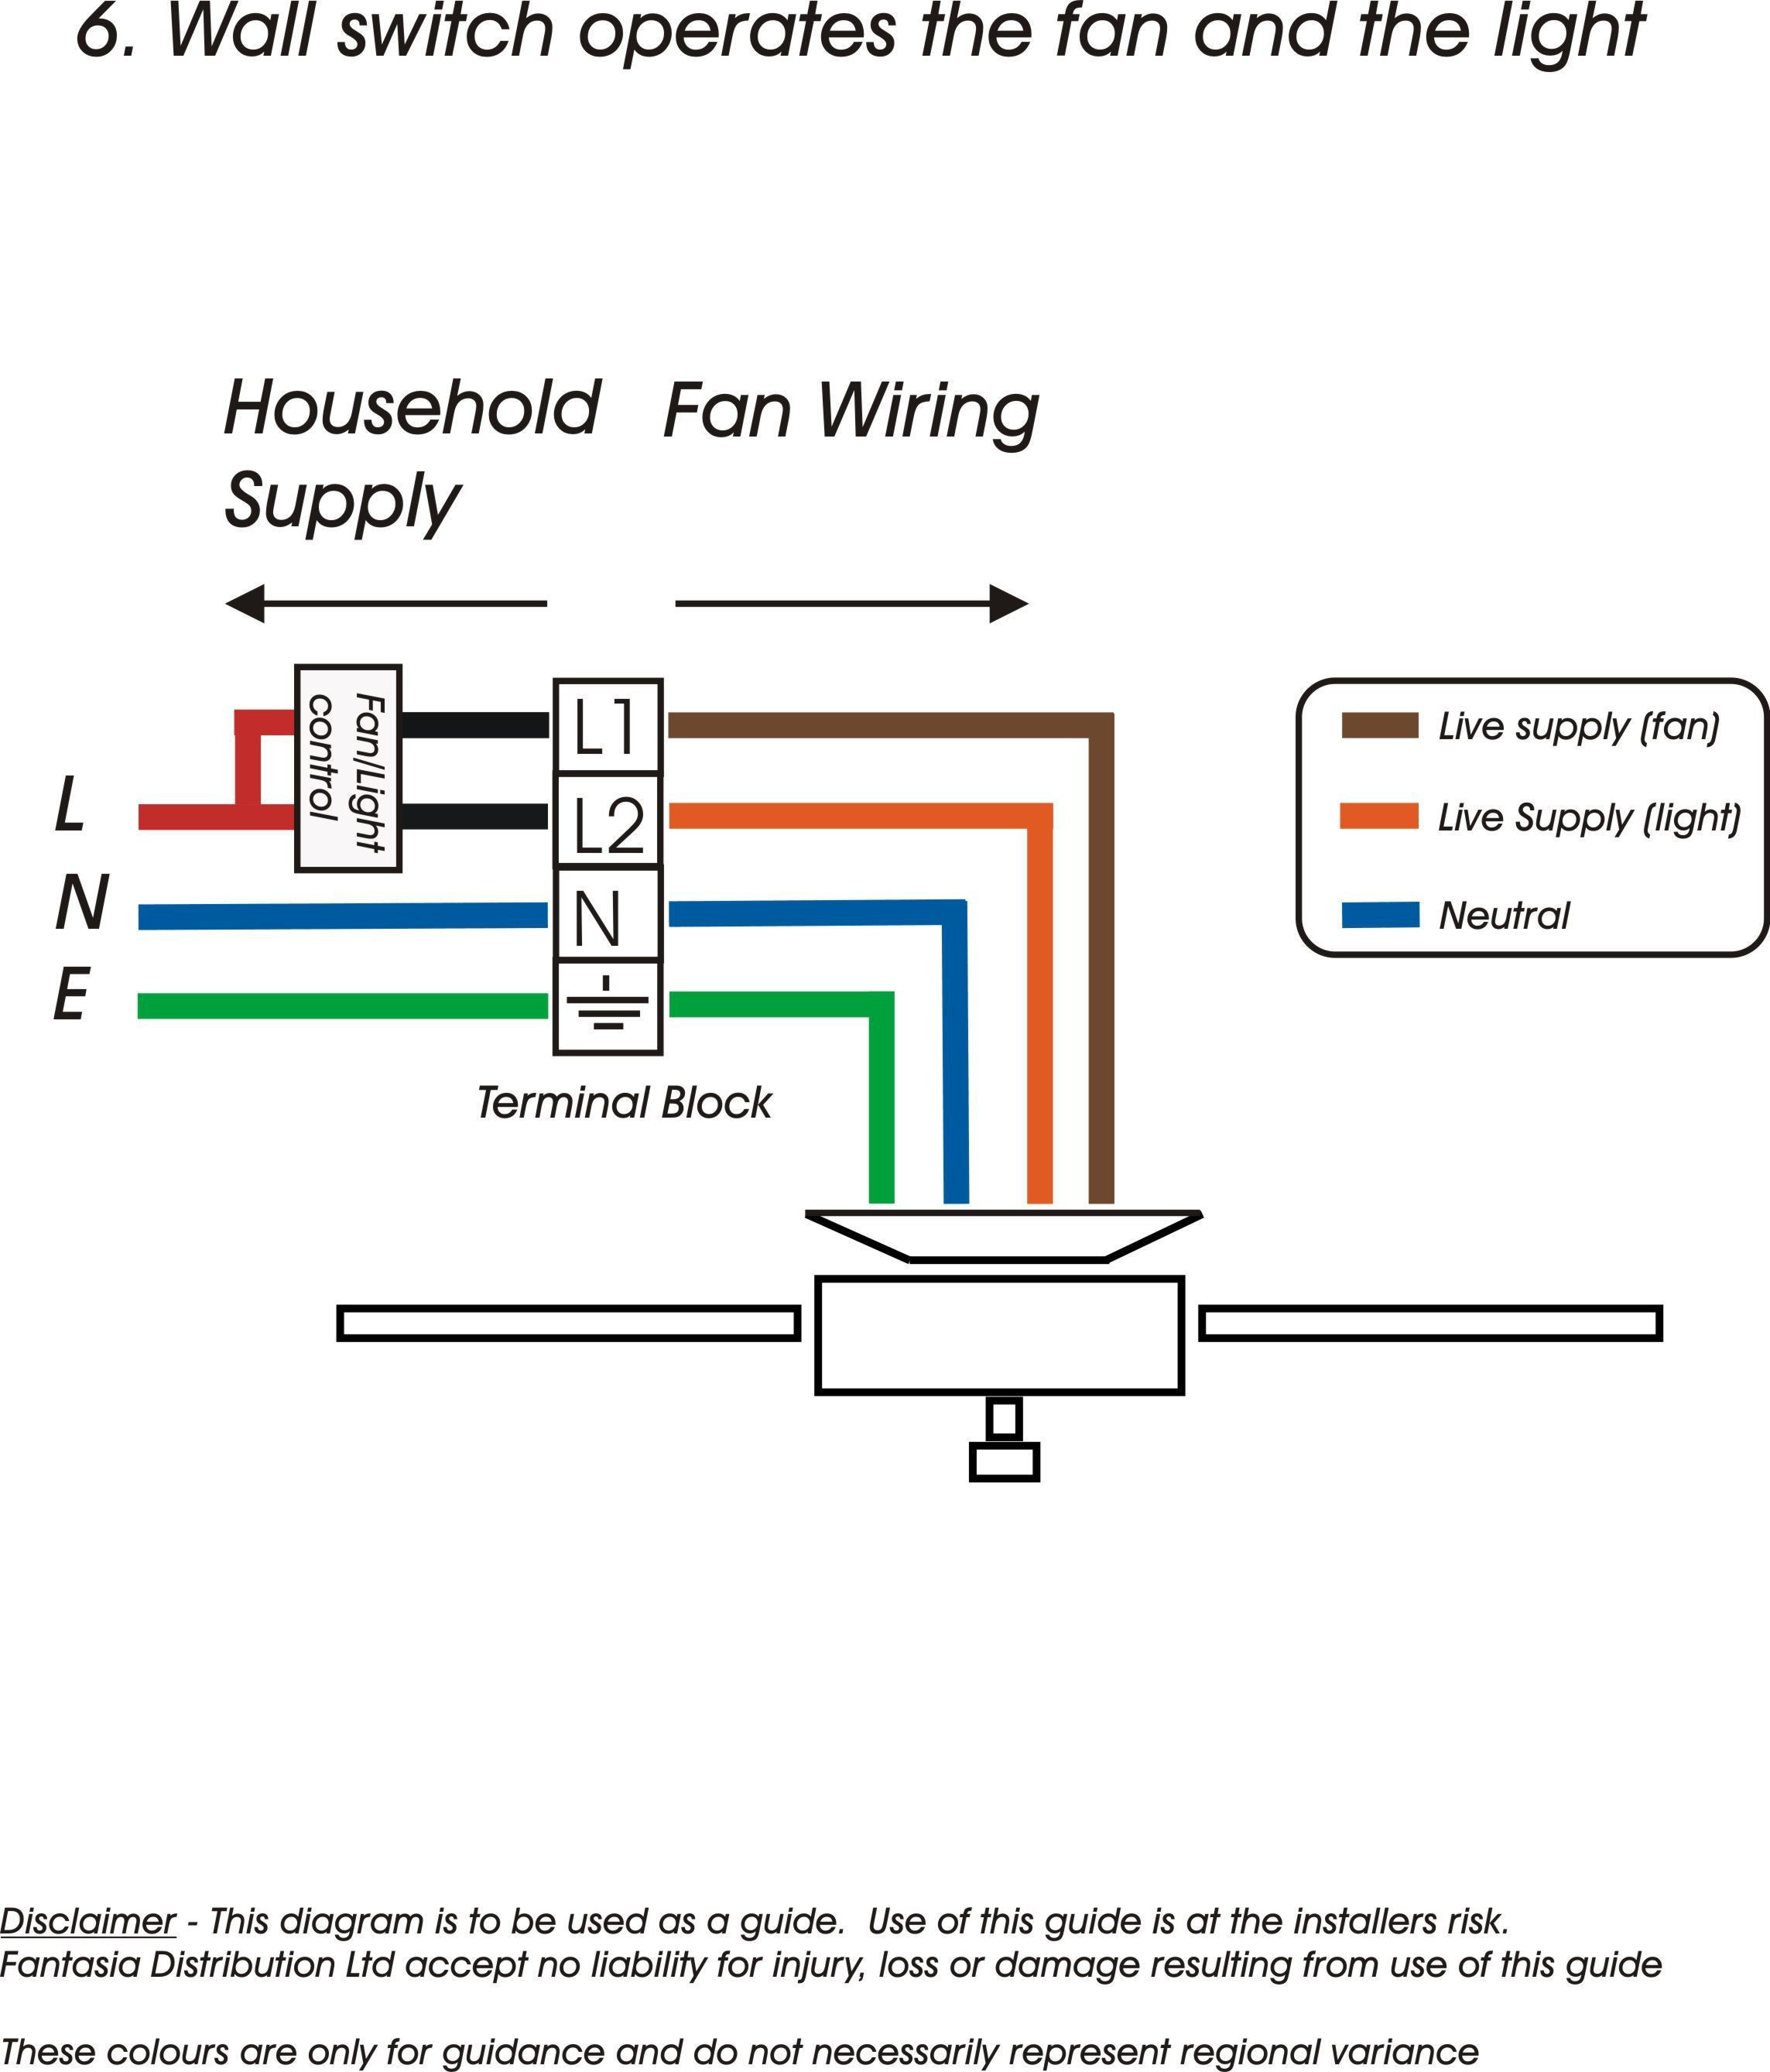 5 Pin Power Window Switch Wiring Diagram Reference Wiring Diagram - 6 Pin Power Window Switch Wiring Diagram